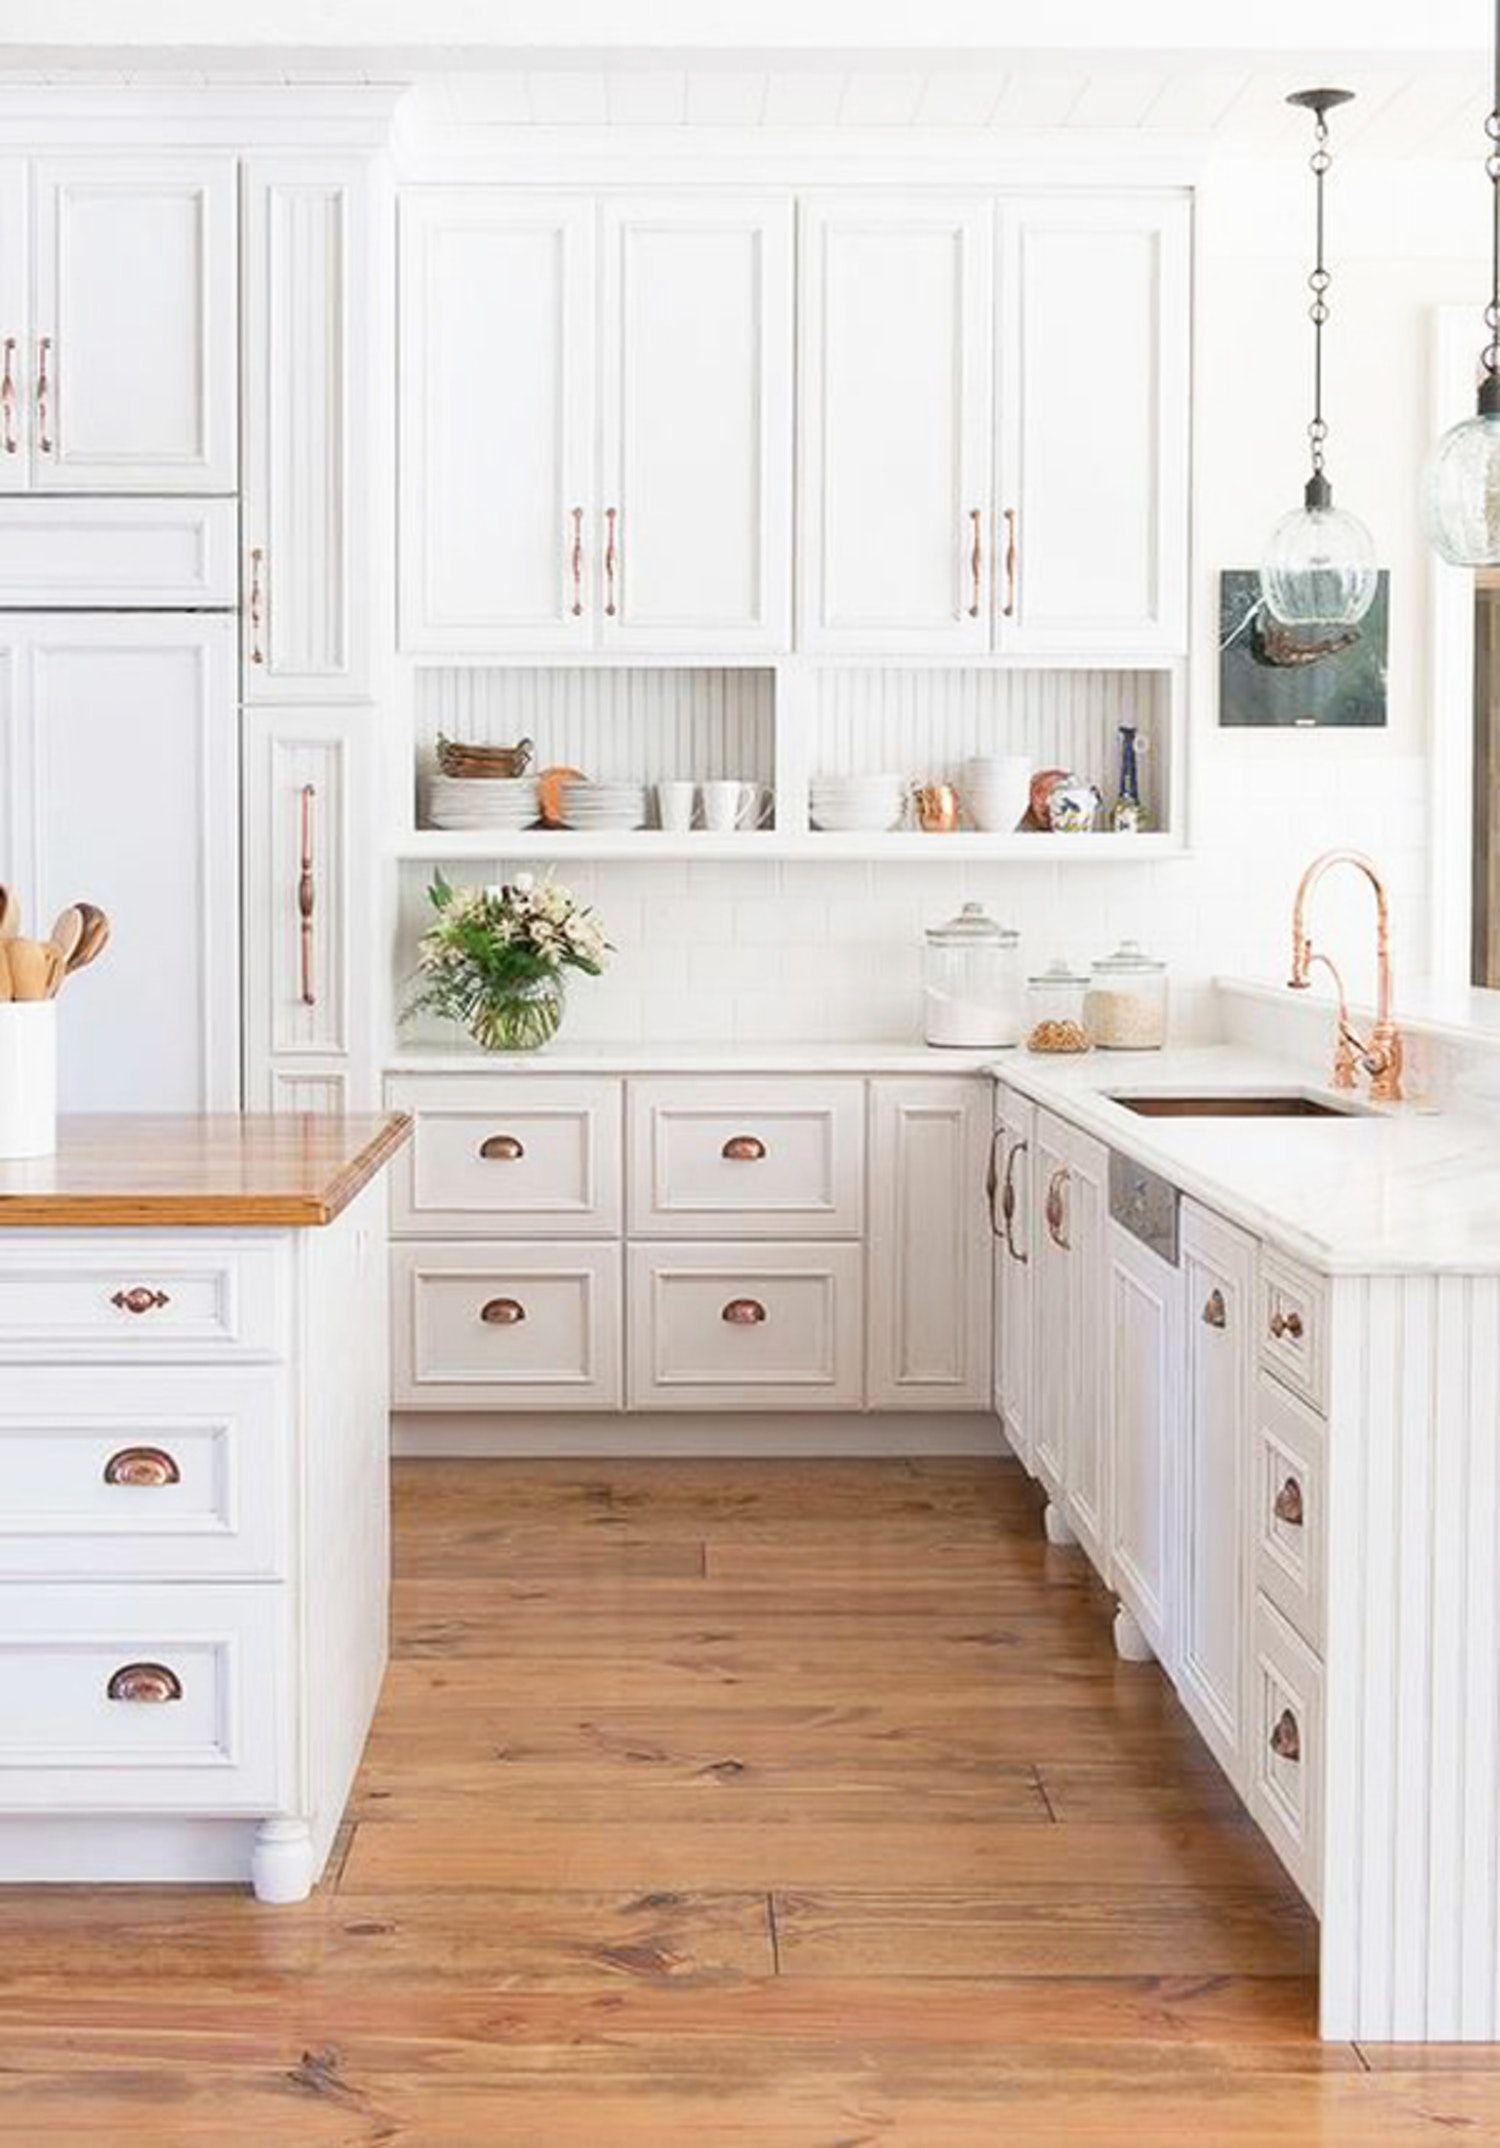 Kitchen Design Shopping Guide Copper Hardware Kitchen Design Kitchen Cabinet Design New Kitchen Inspiration